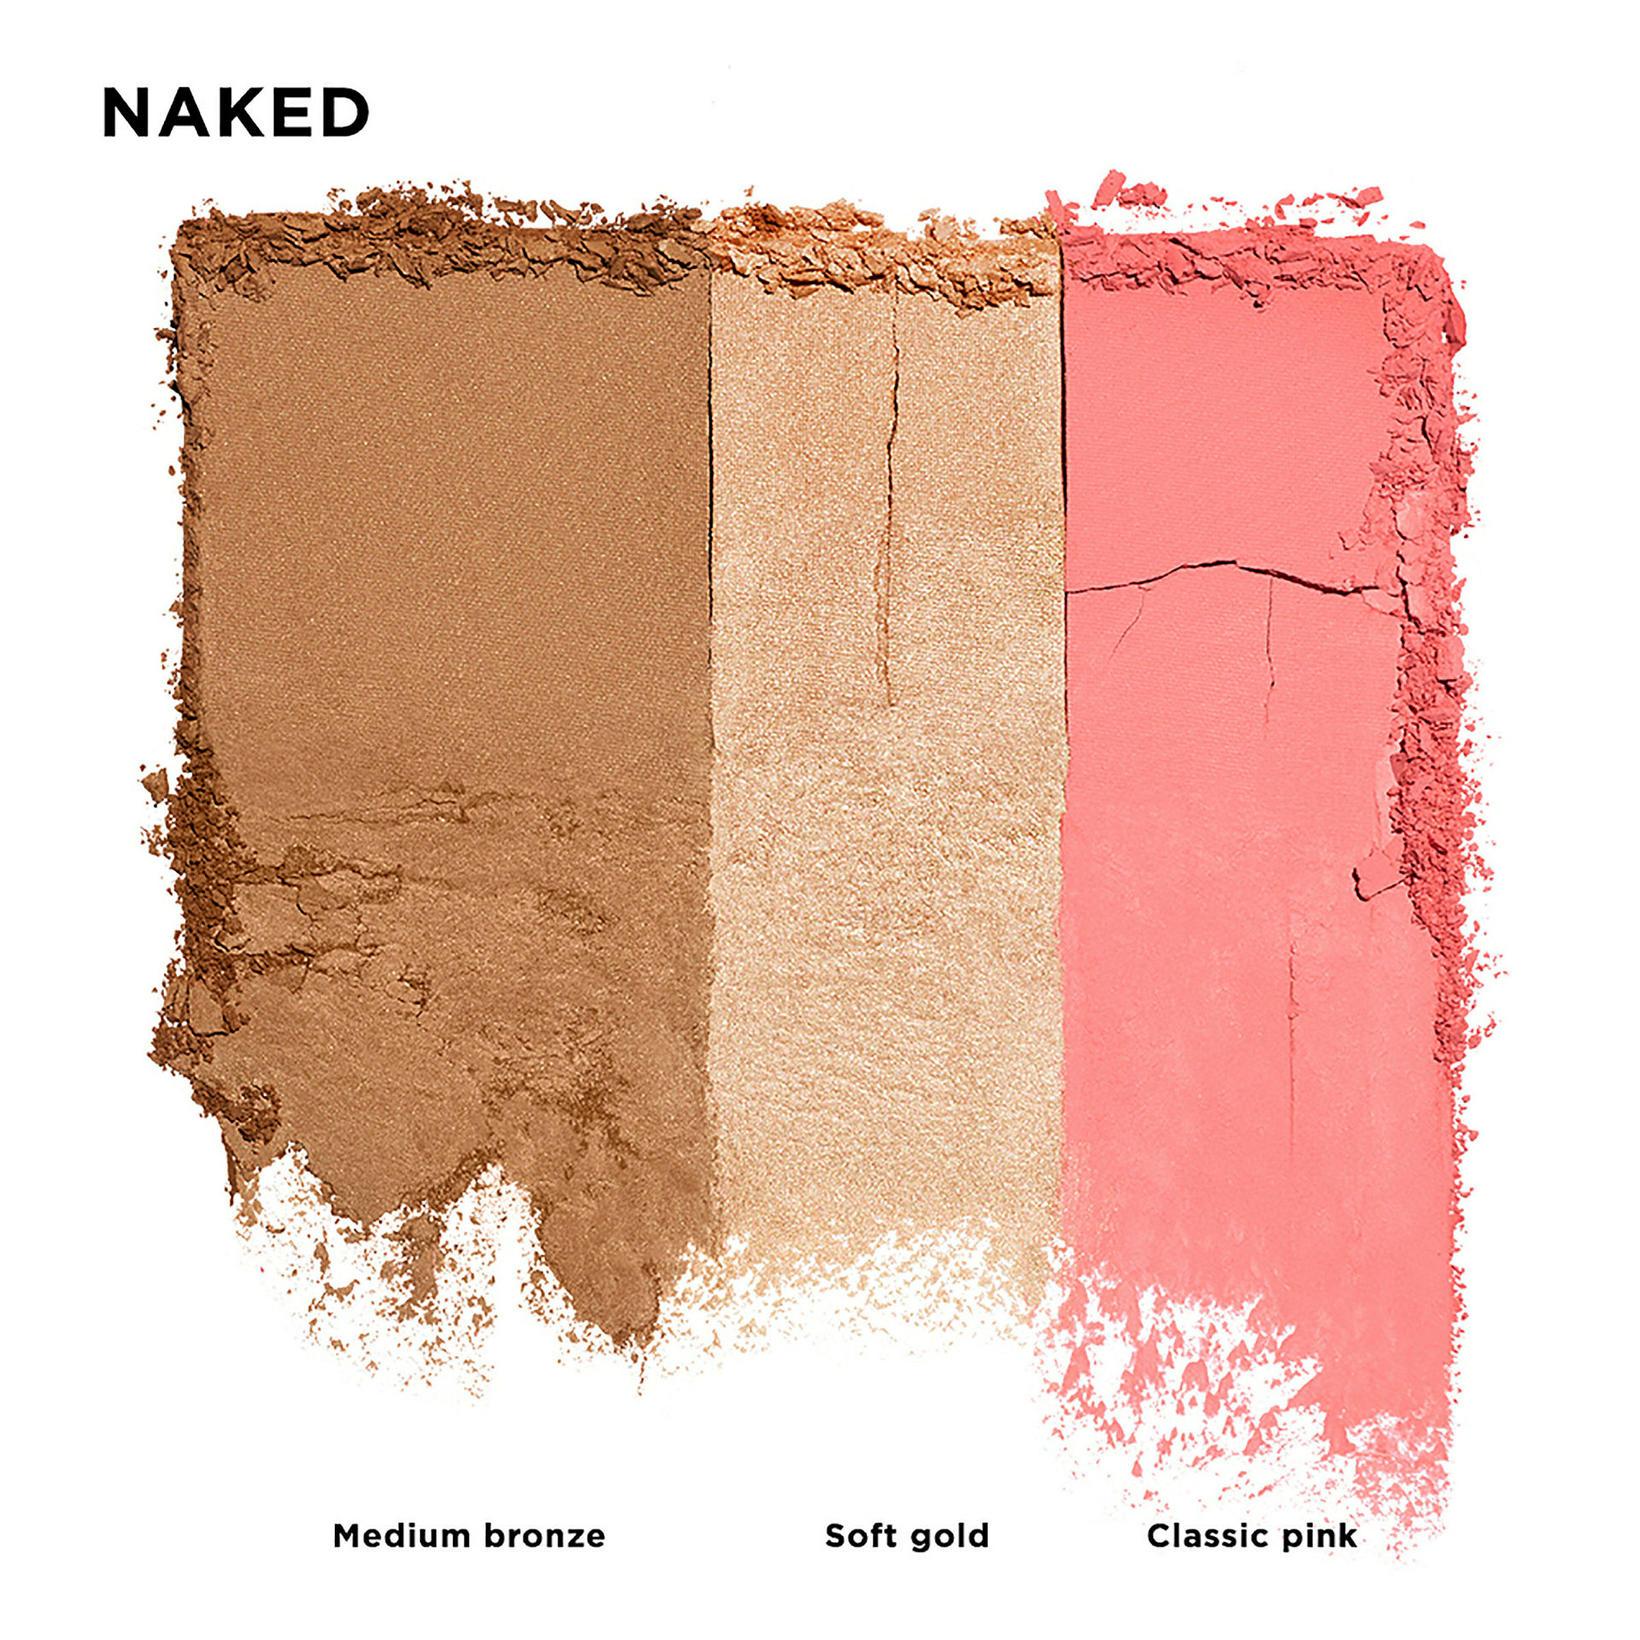 Stay Naked Threesome pallettan frá Urban Decay skartar þremur litum. …